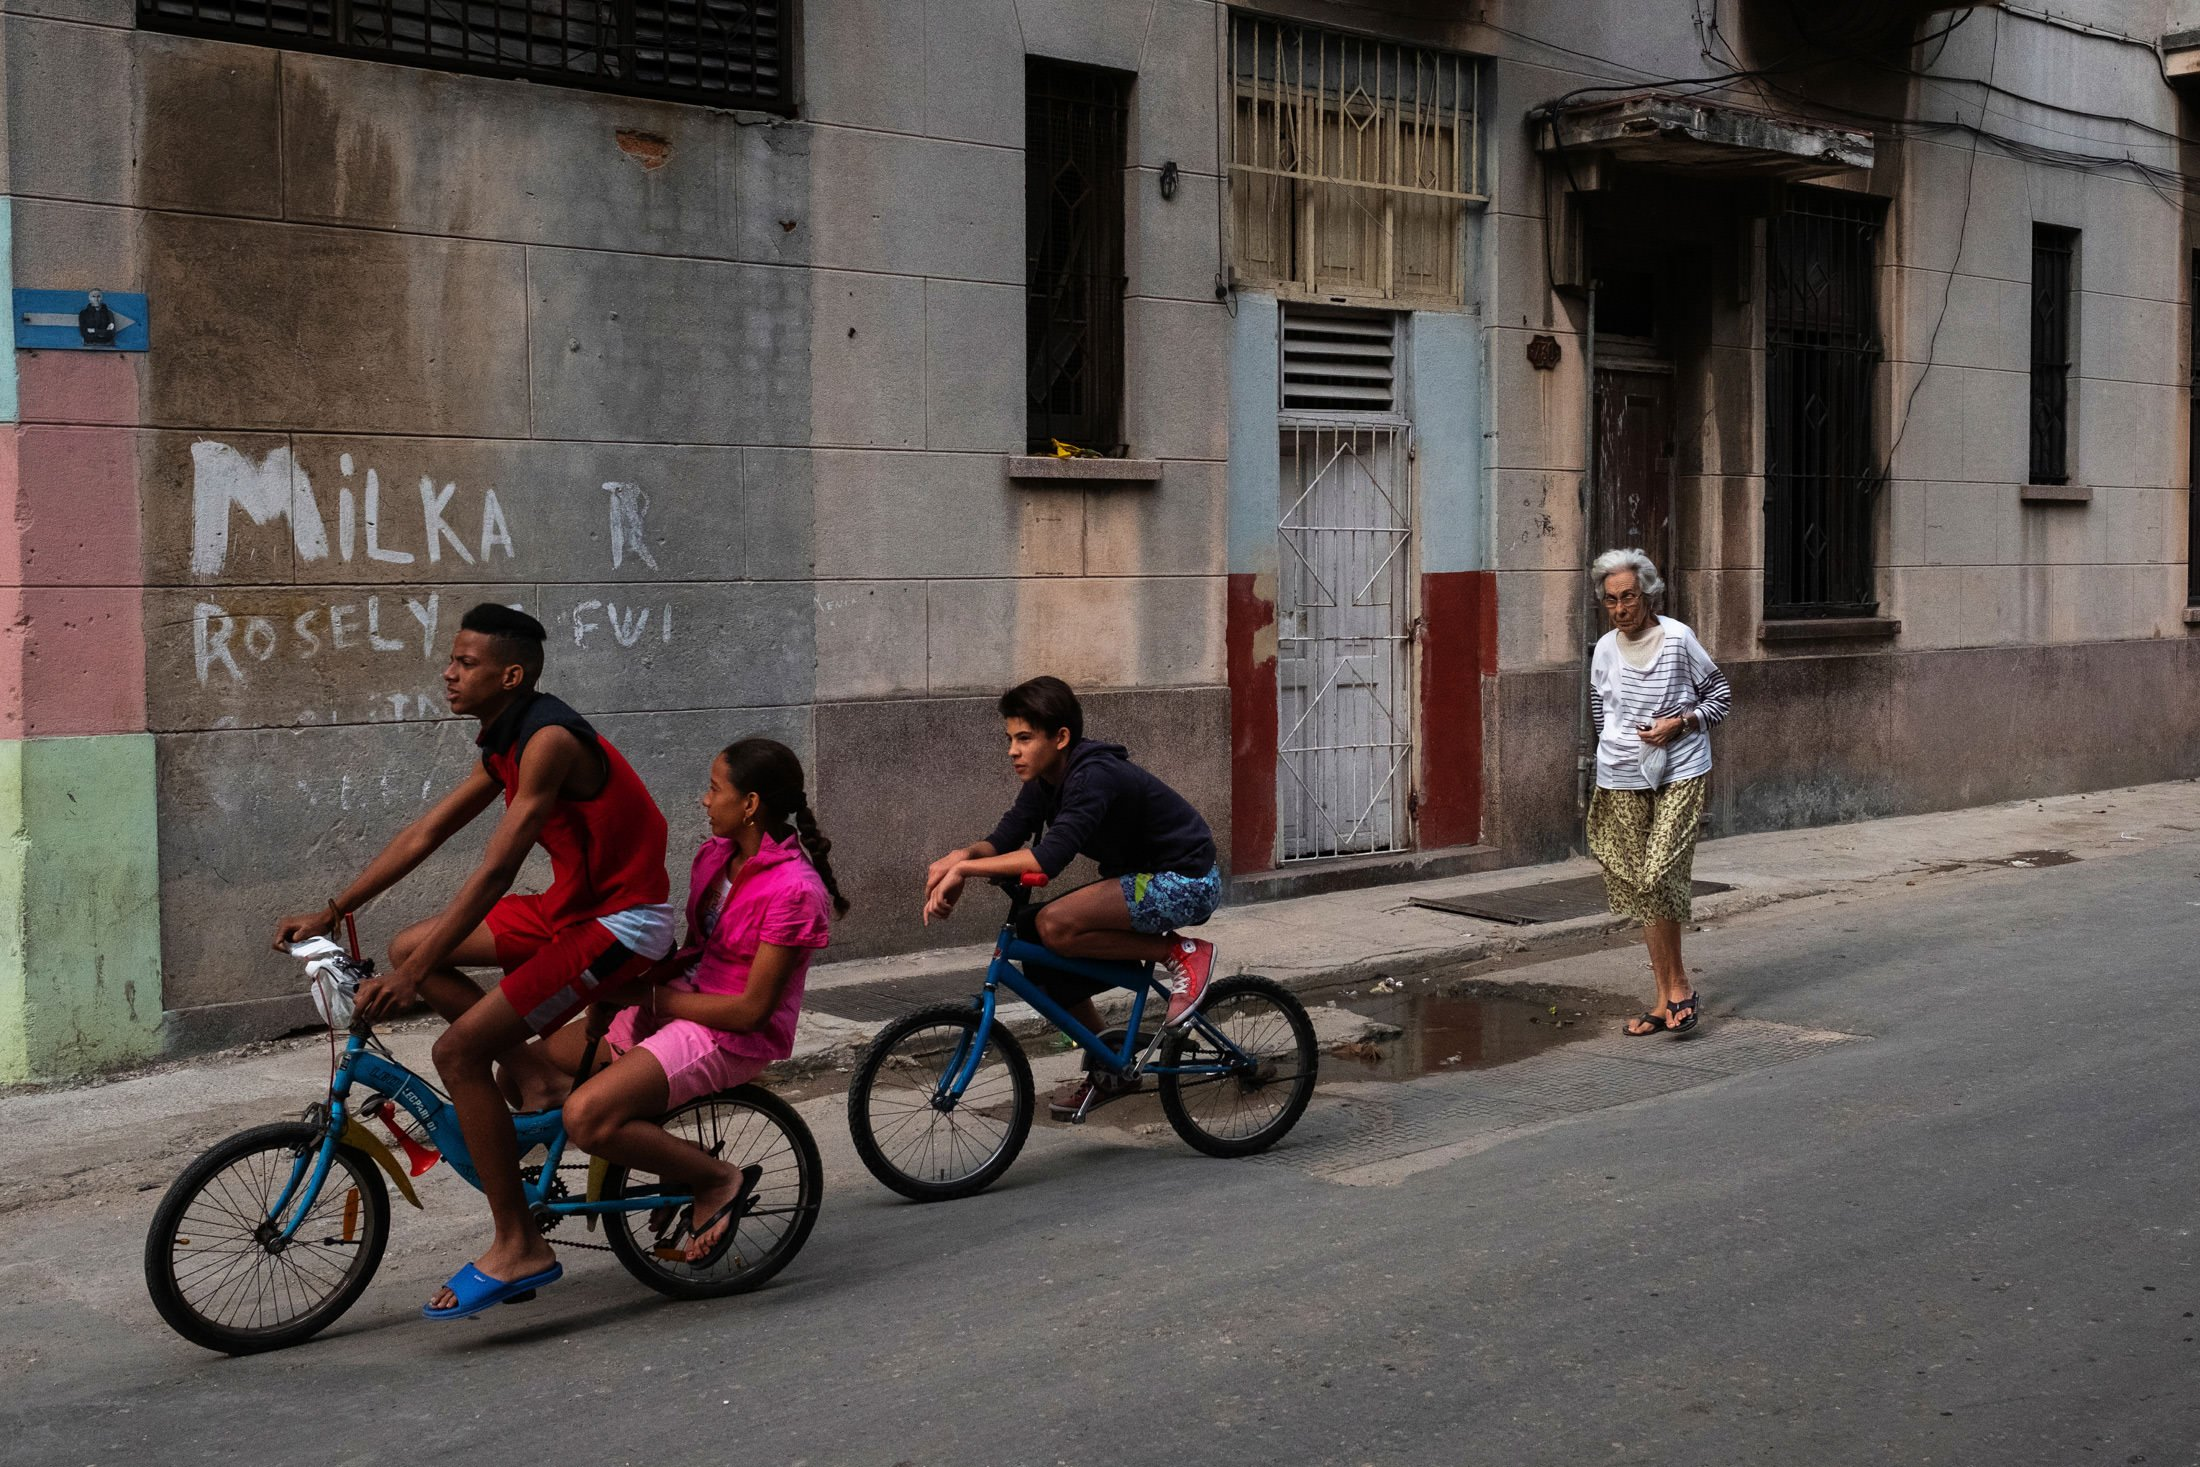 three children on bicycles in Havana, Cuba